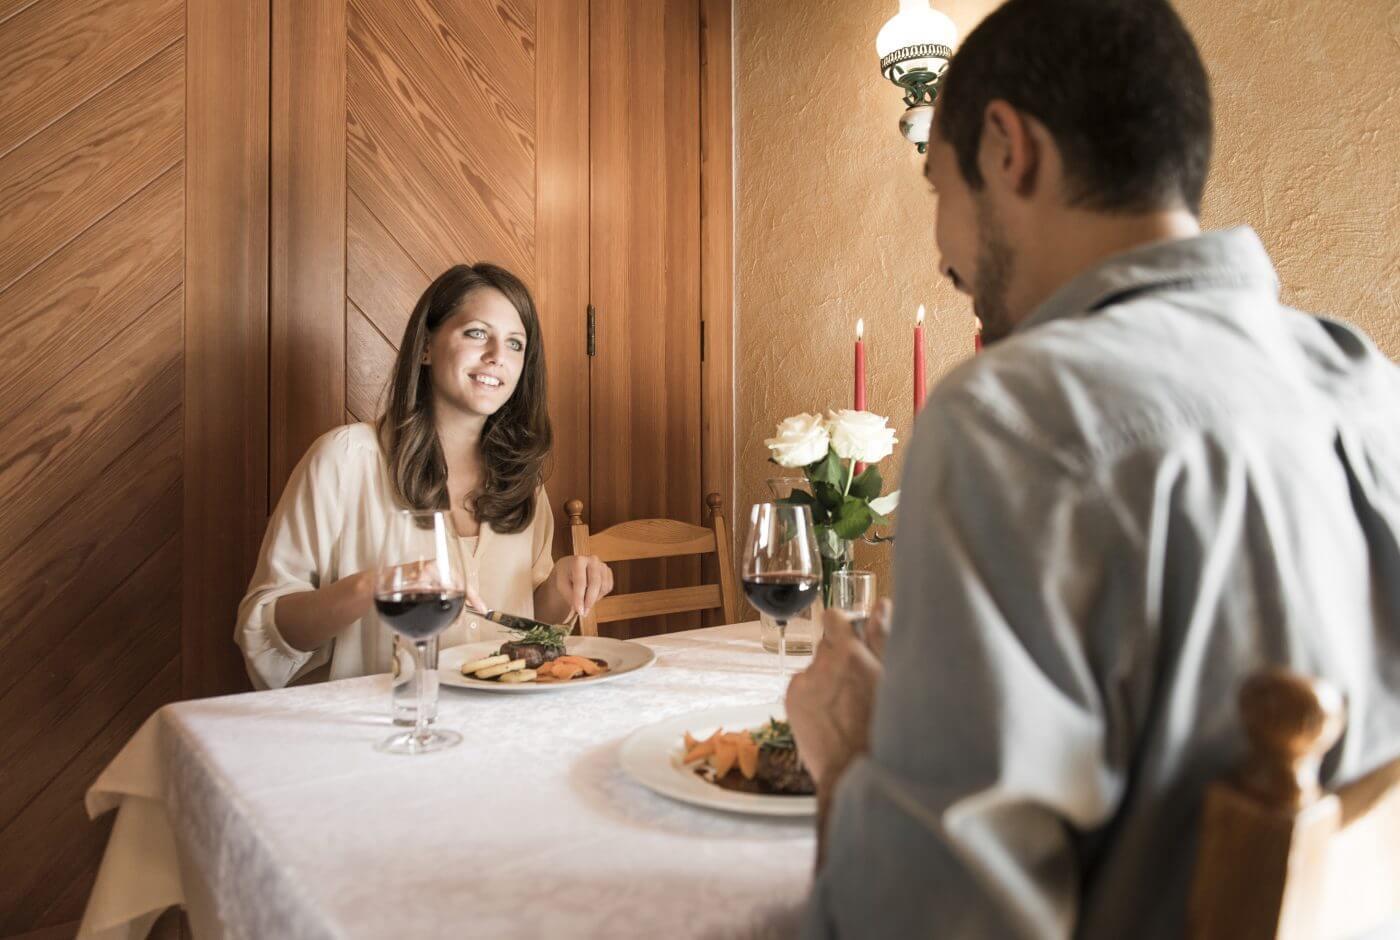 Romantik, Dinner